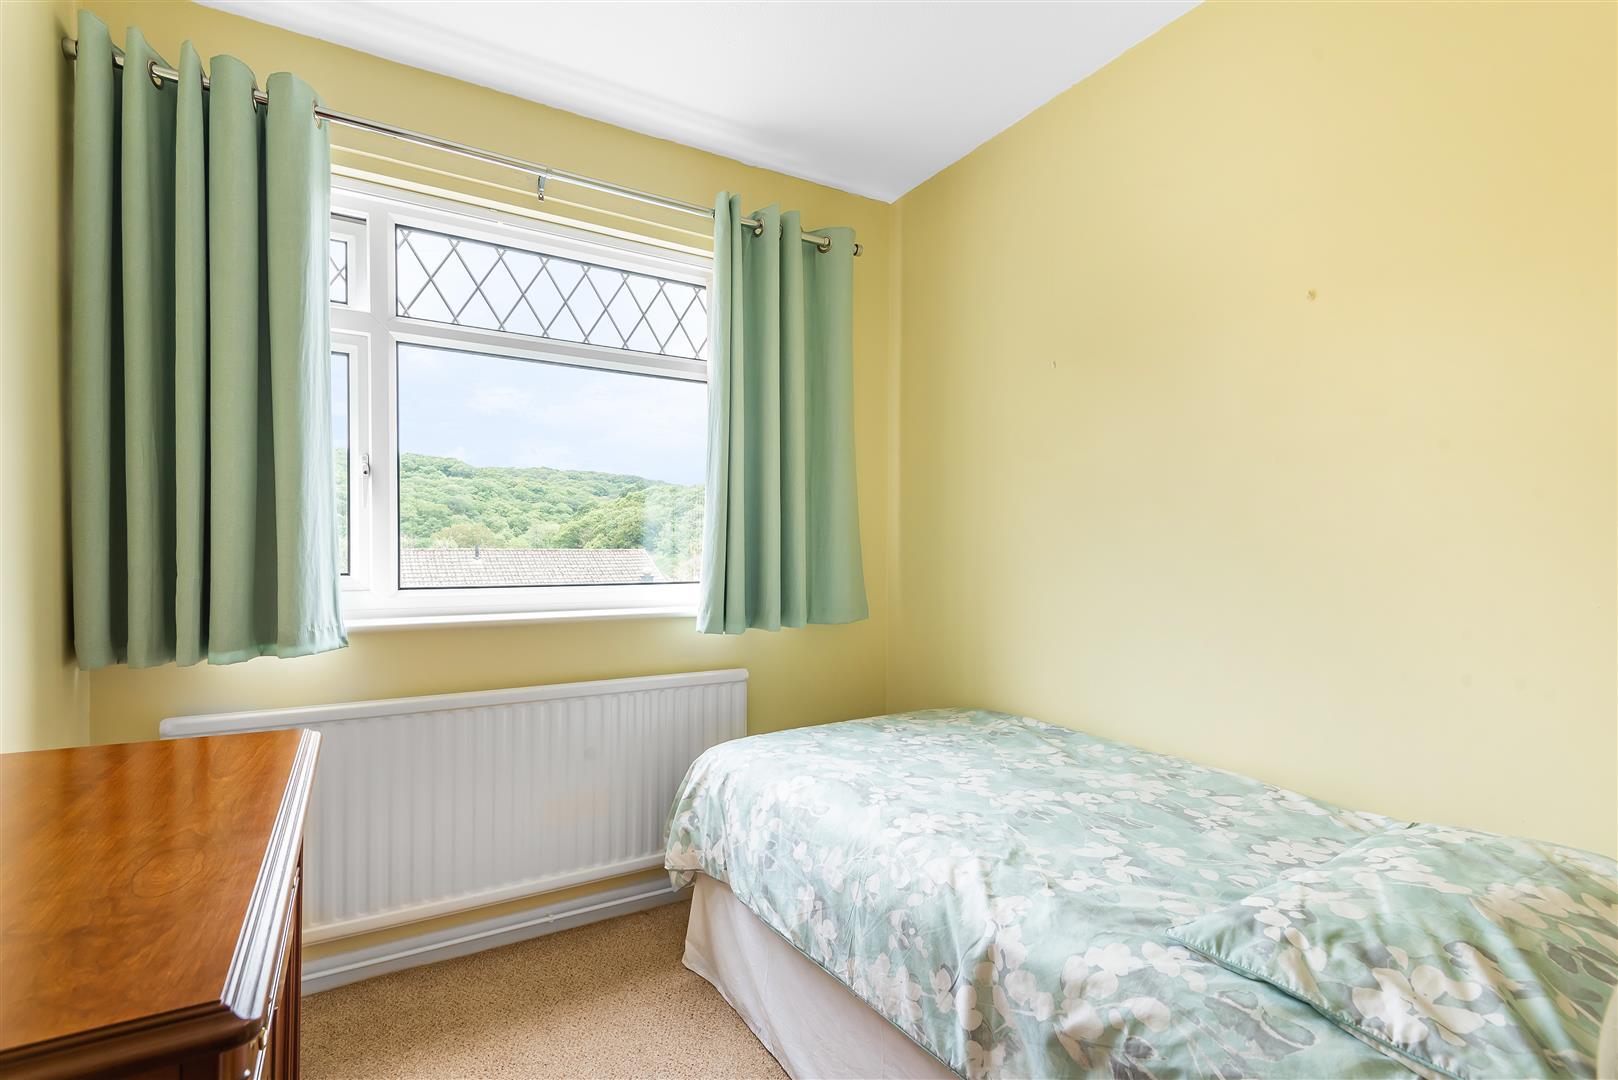 Royal Oak Road, Sketty, Swansea, SA2 8ES